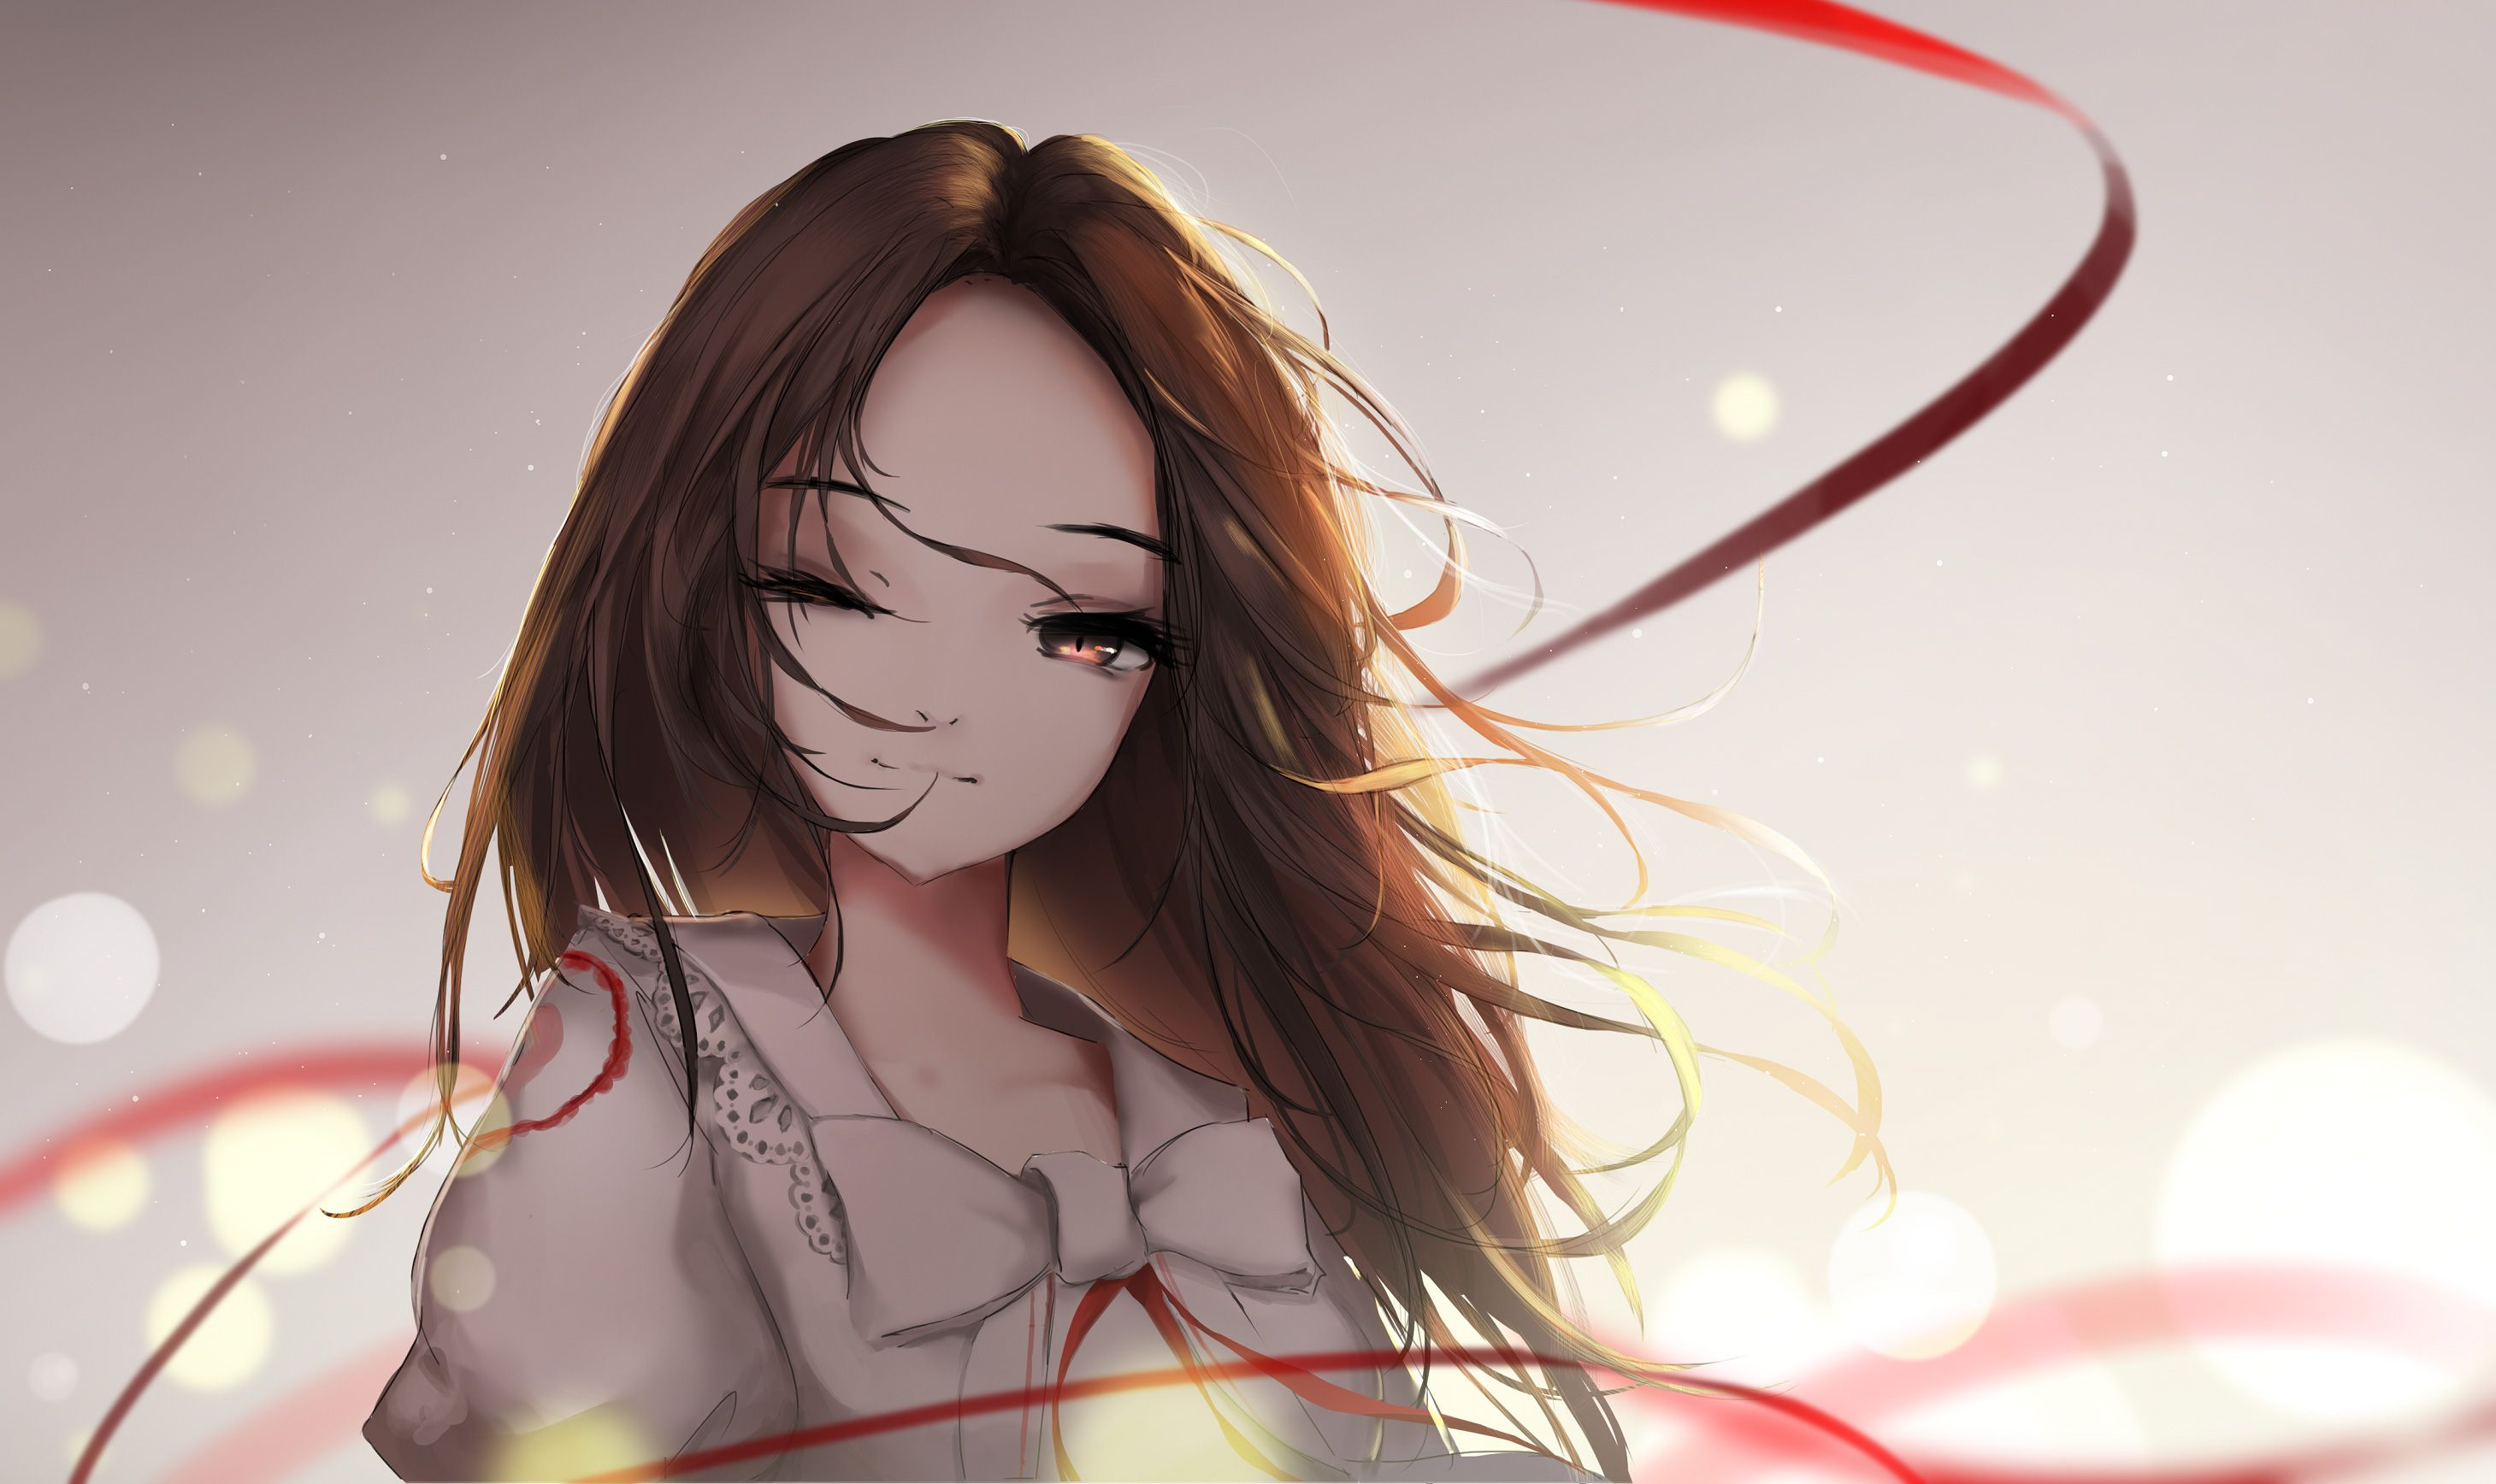 brown hair anime aesthetic